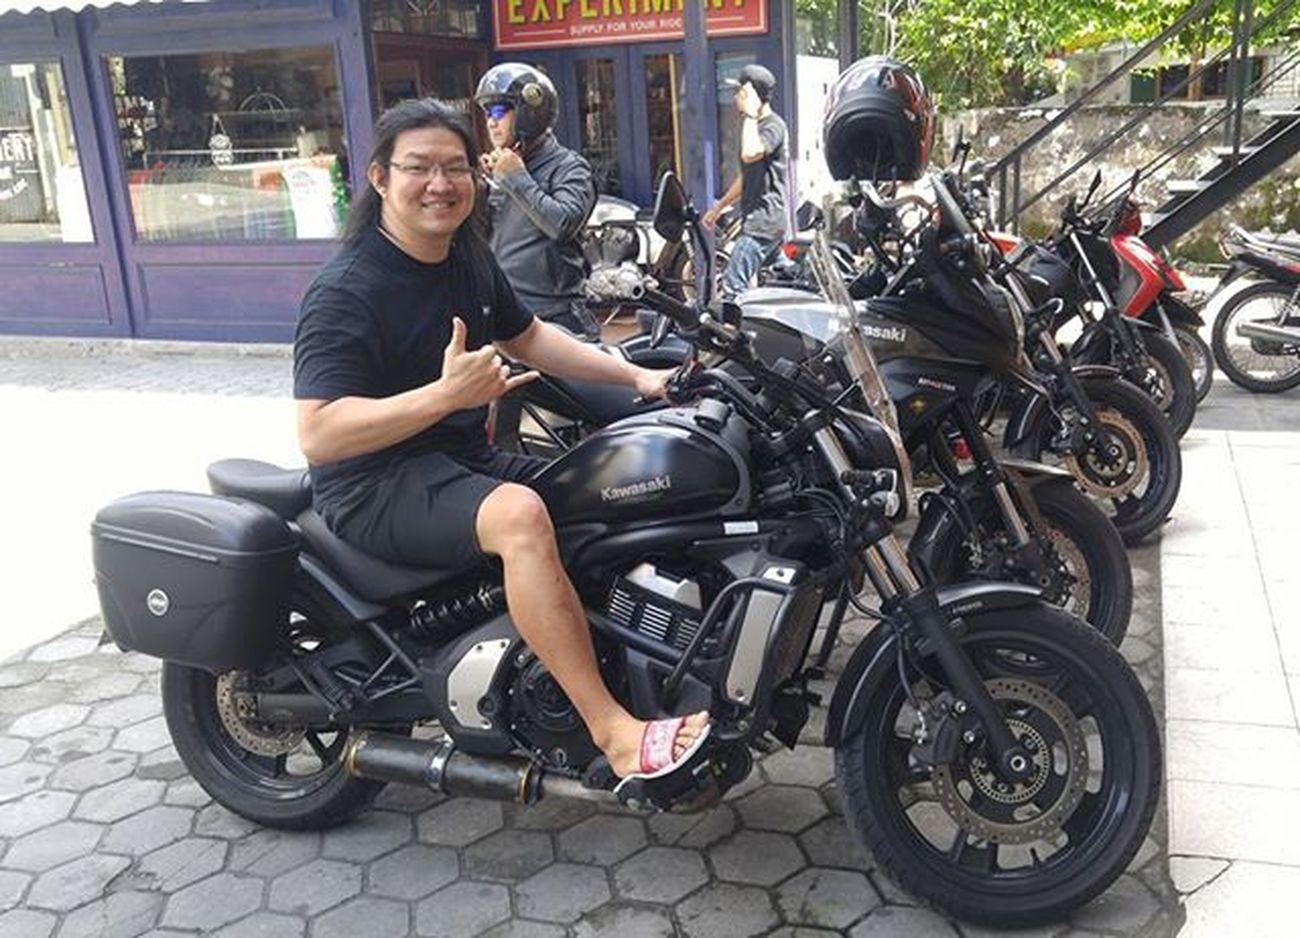 Hmmm... Motorcycle Kawi Kawination Vulcan Vulcan650 Kawasaki Val  2016 😚 RideOrDie